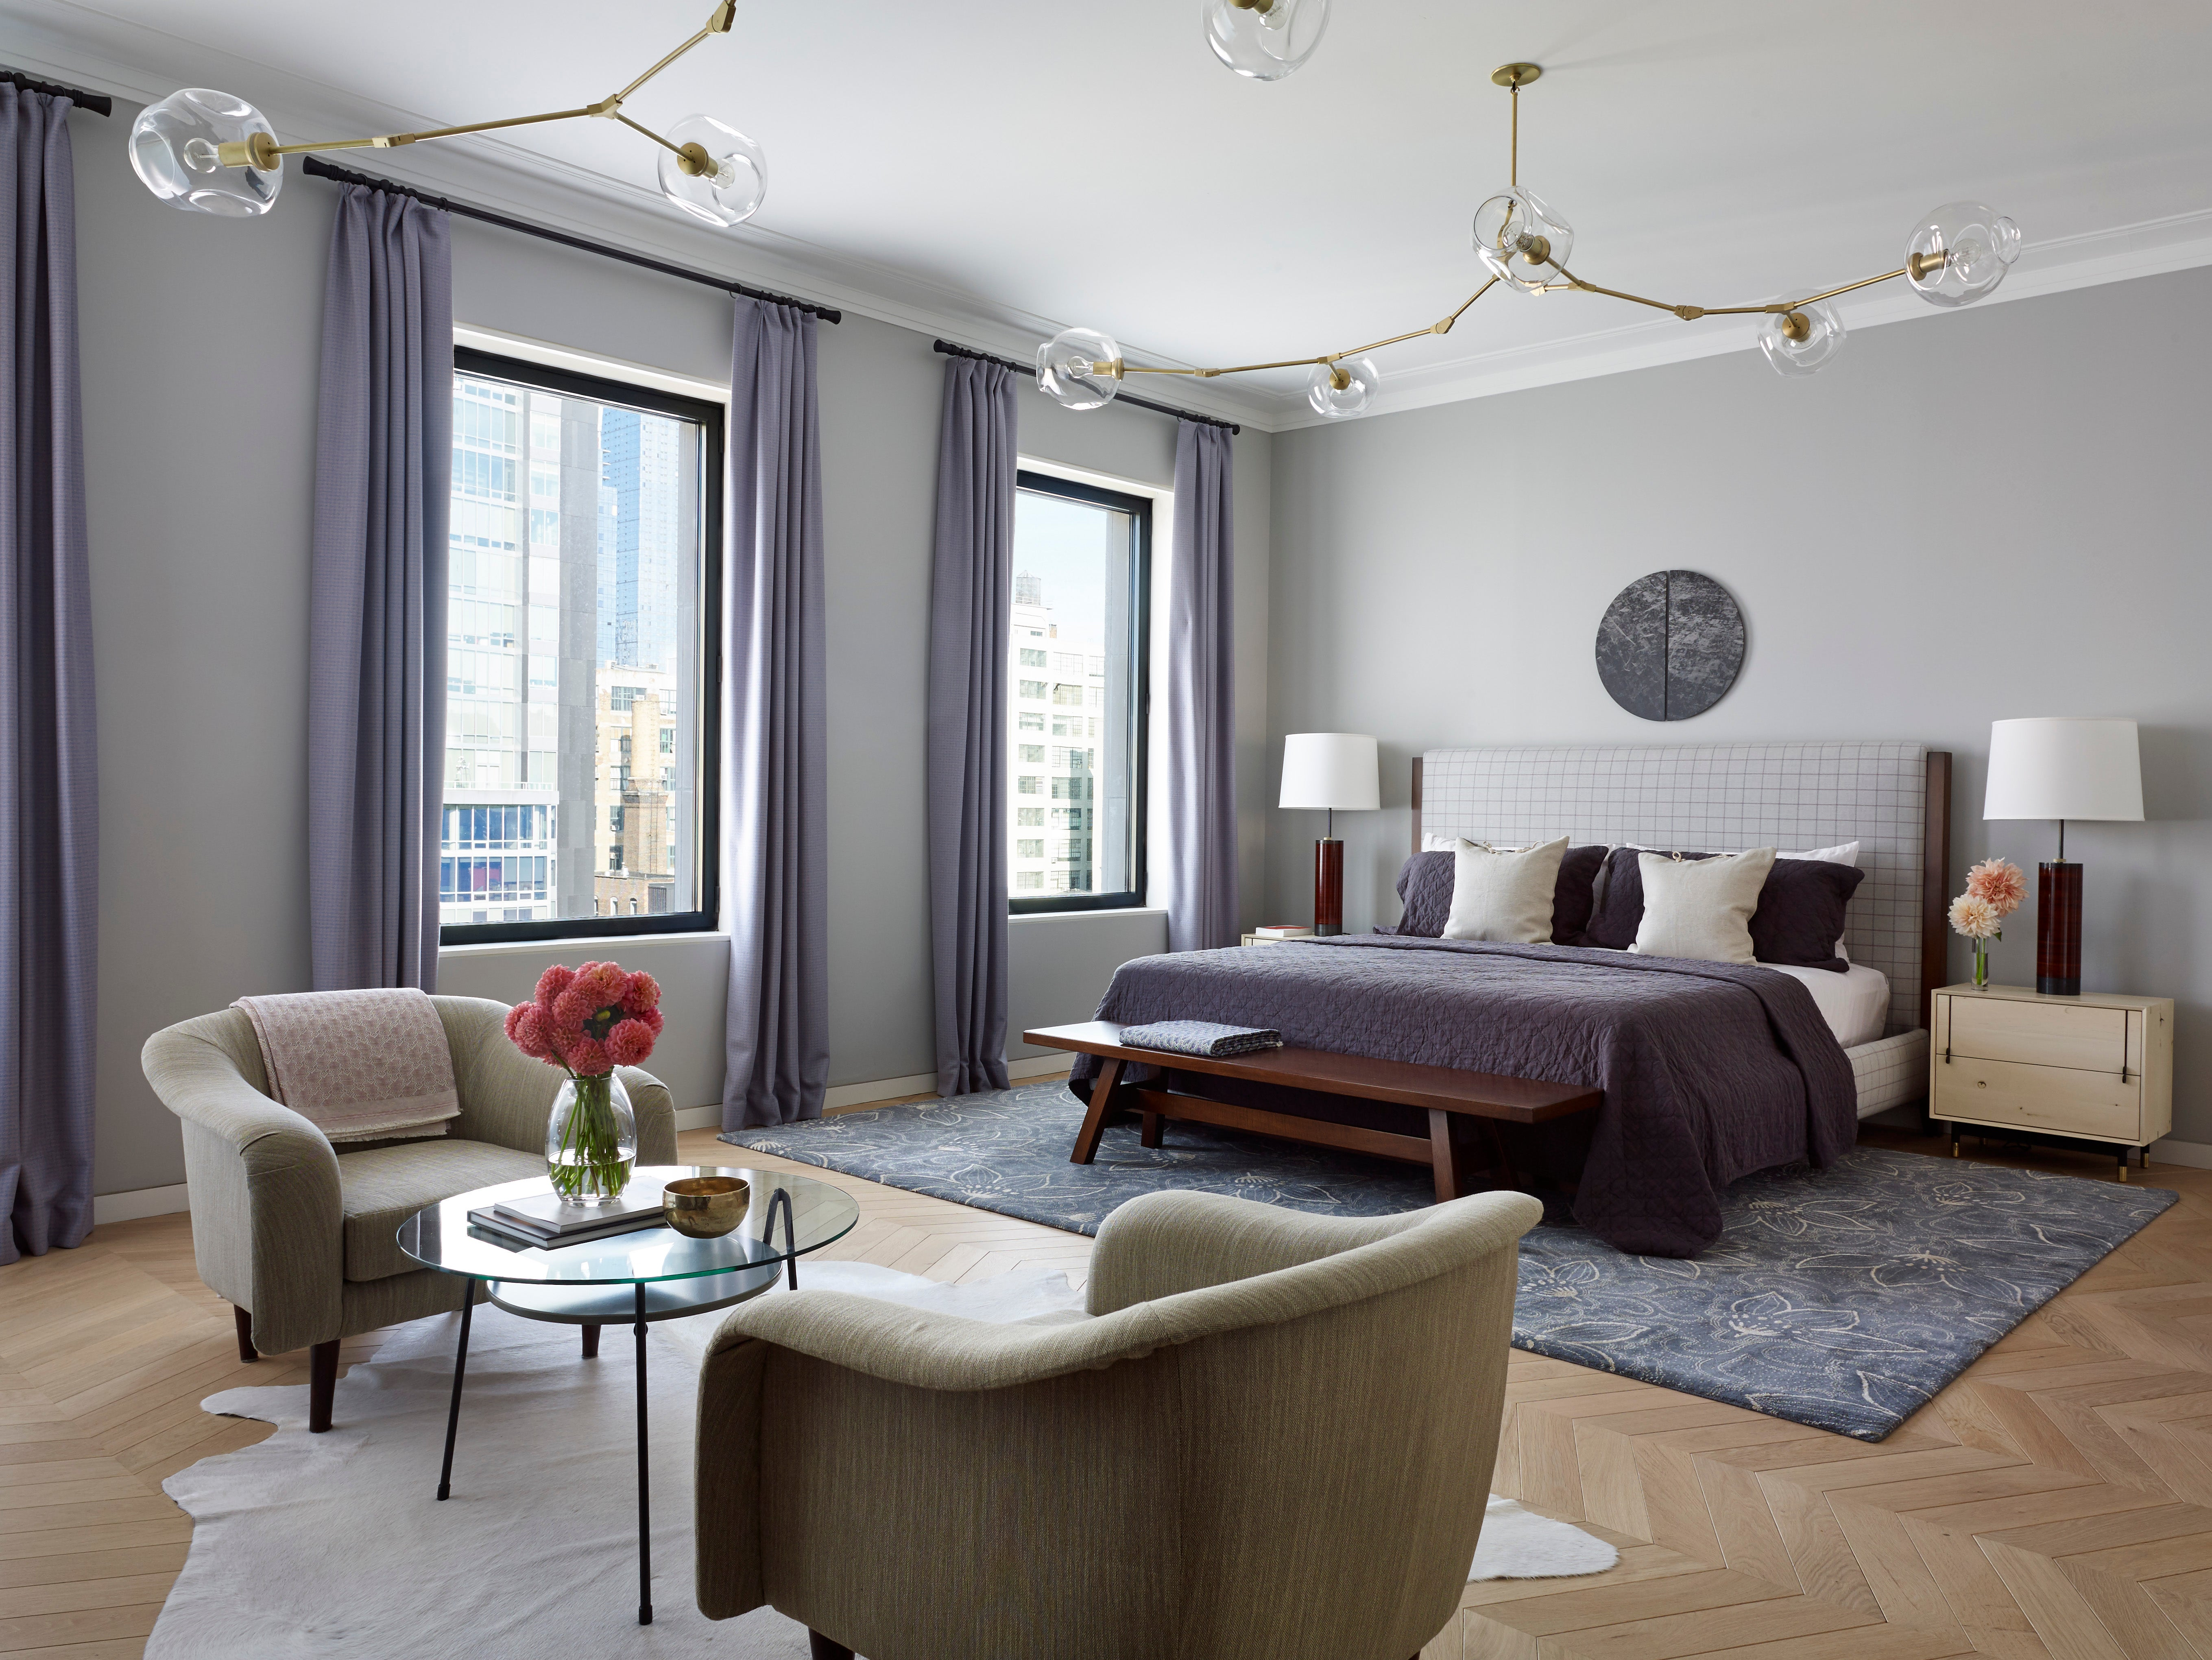 Bedroom By Damon Liss Design On 1stdibs